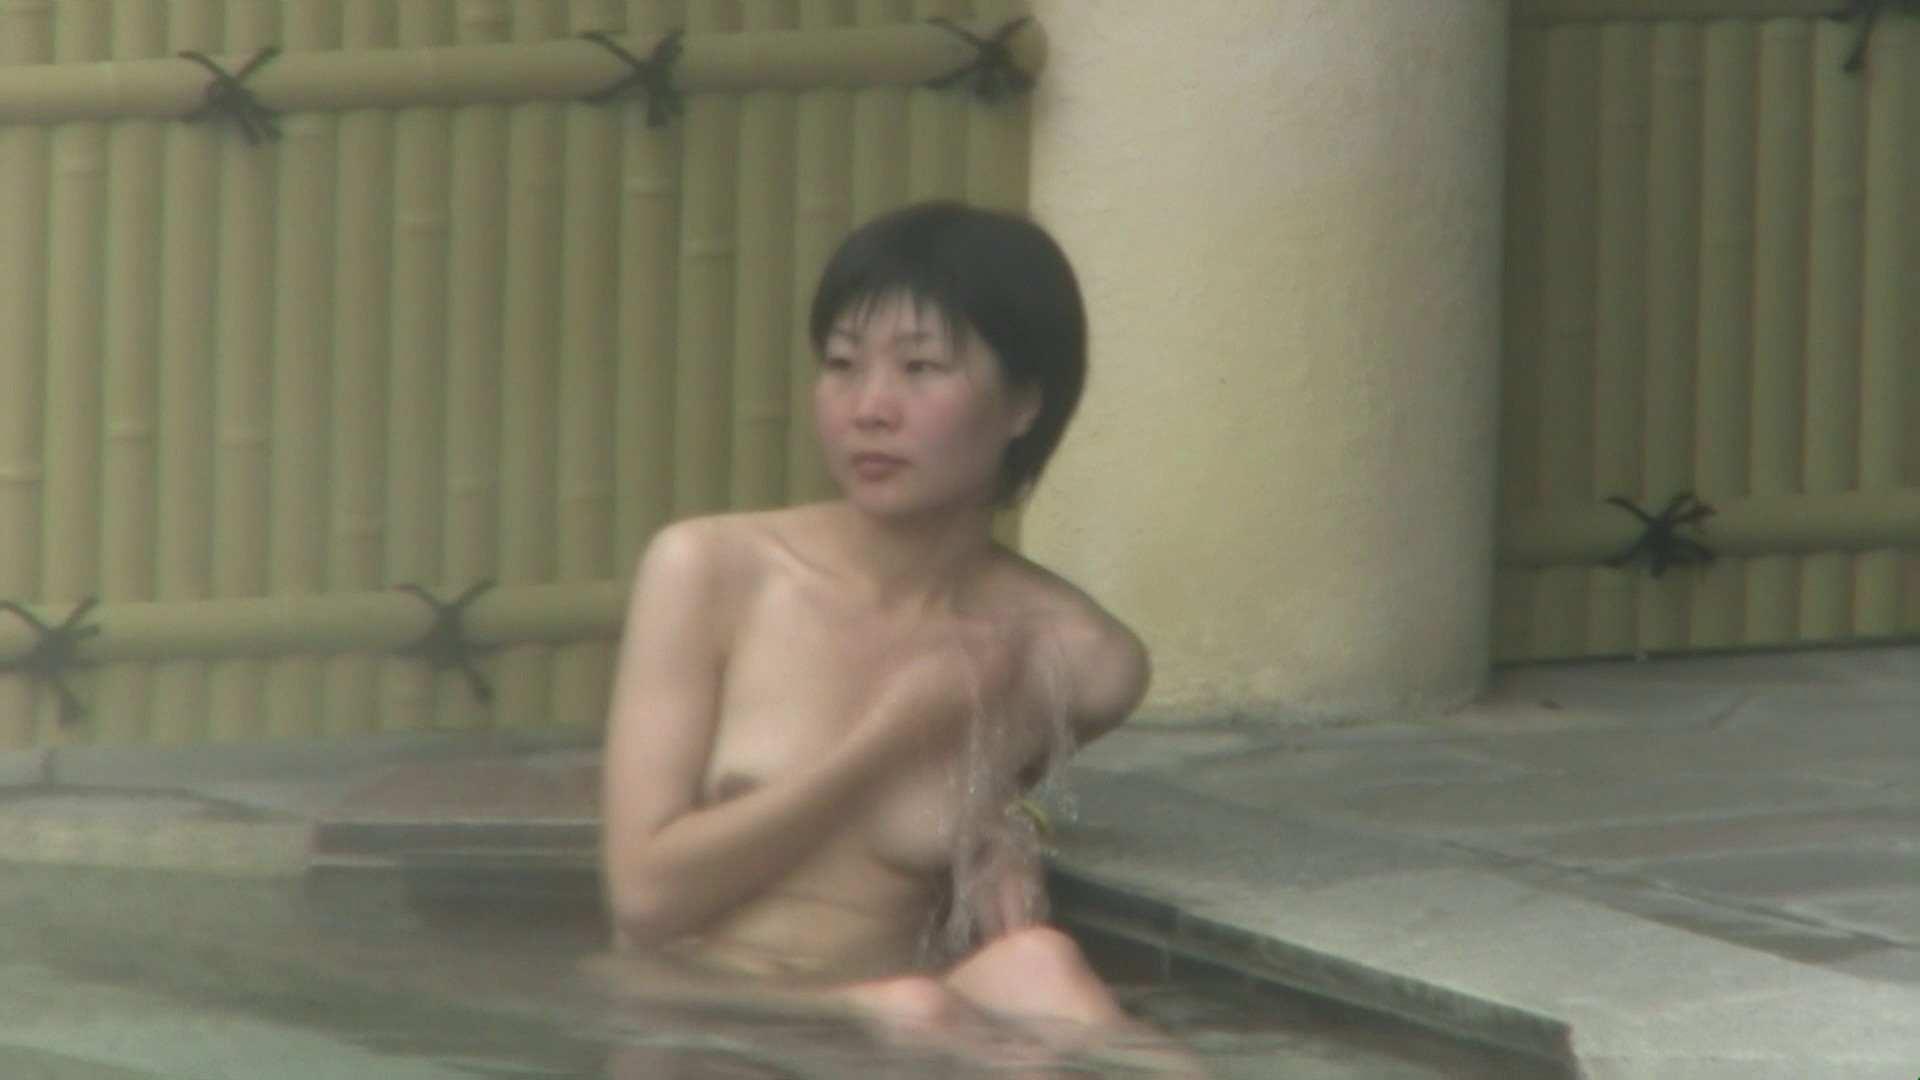 Aquaな露天風呂Vol.75【VIP限定】 露天 ワレメ無修正動画無料 10pic 8